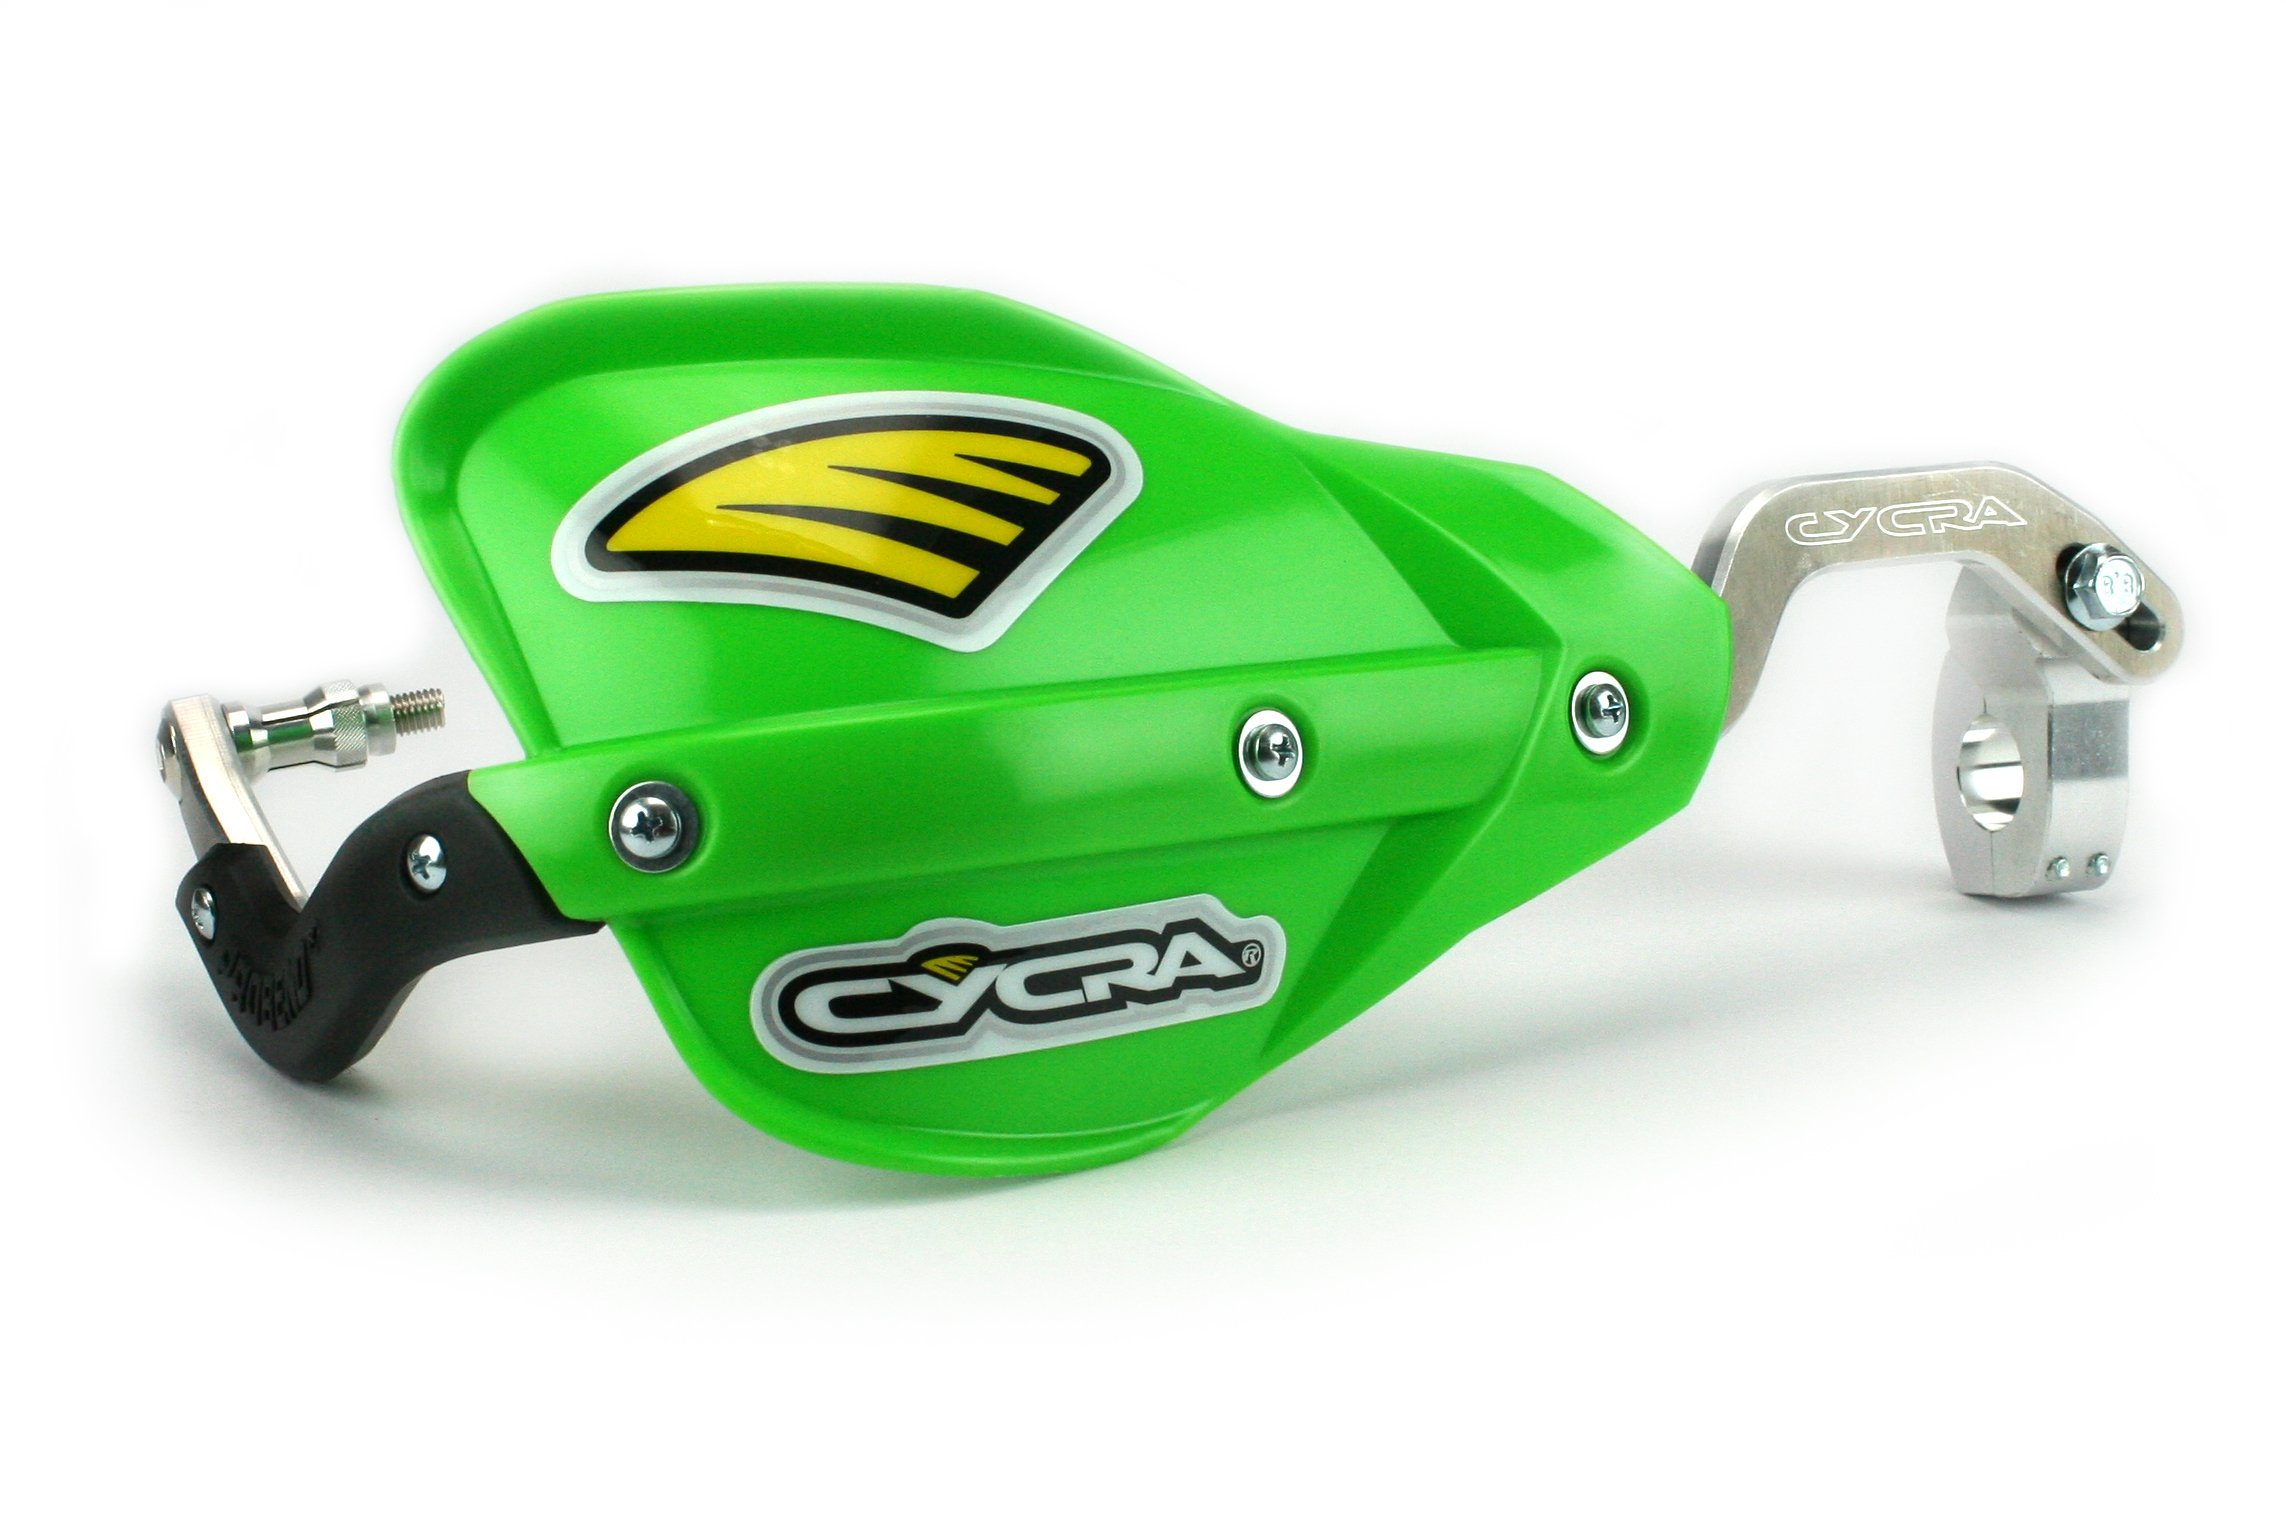 Cycra Probend CRM for 1-1/8'' Handlebar Green